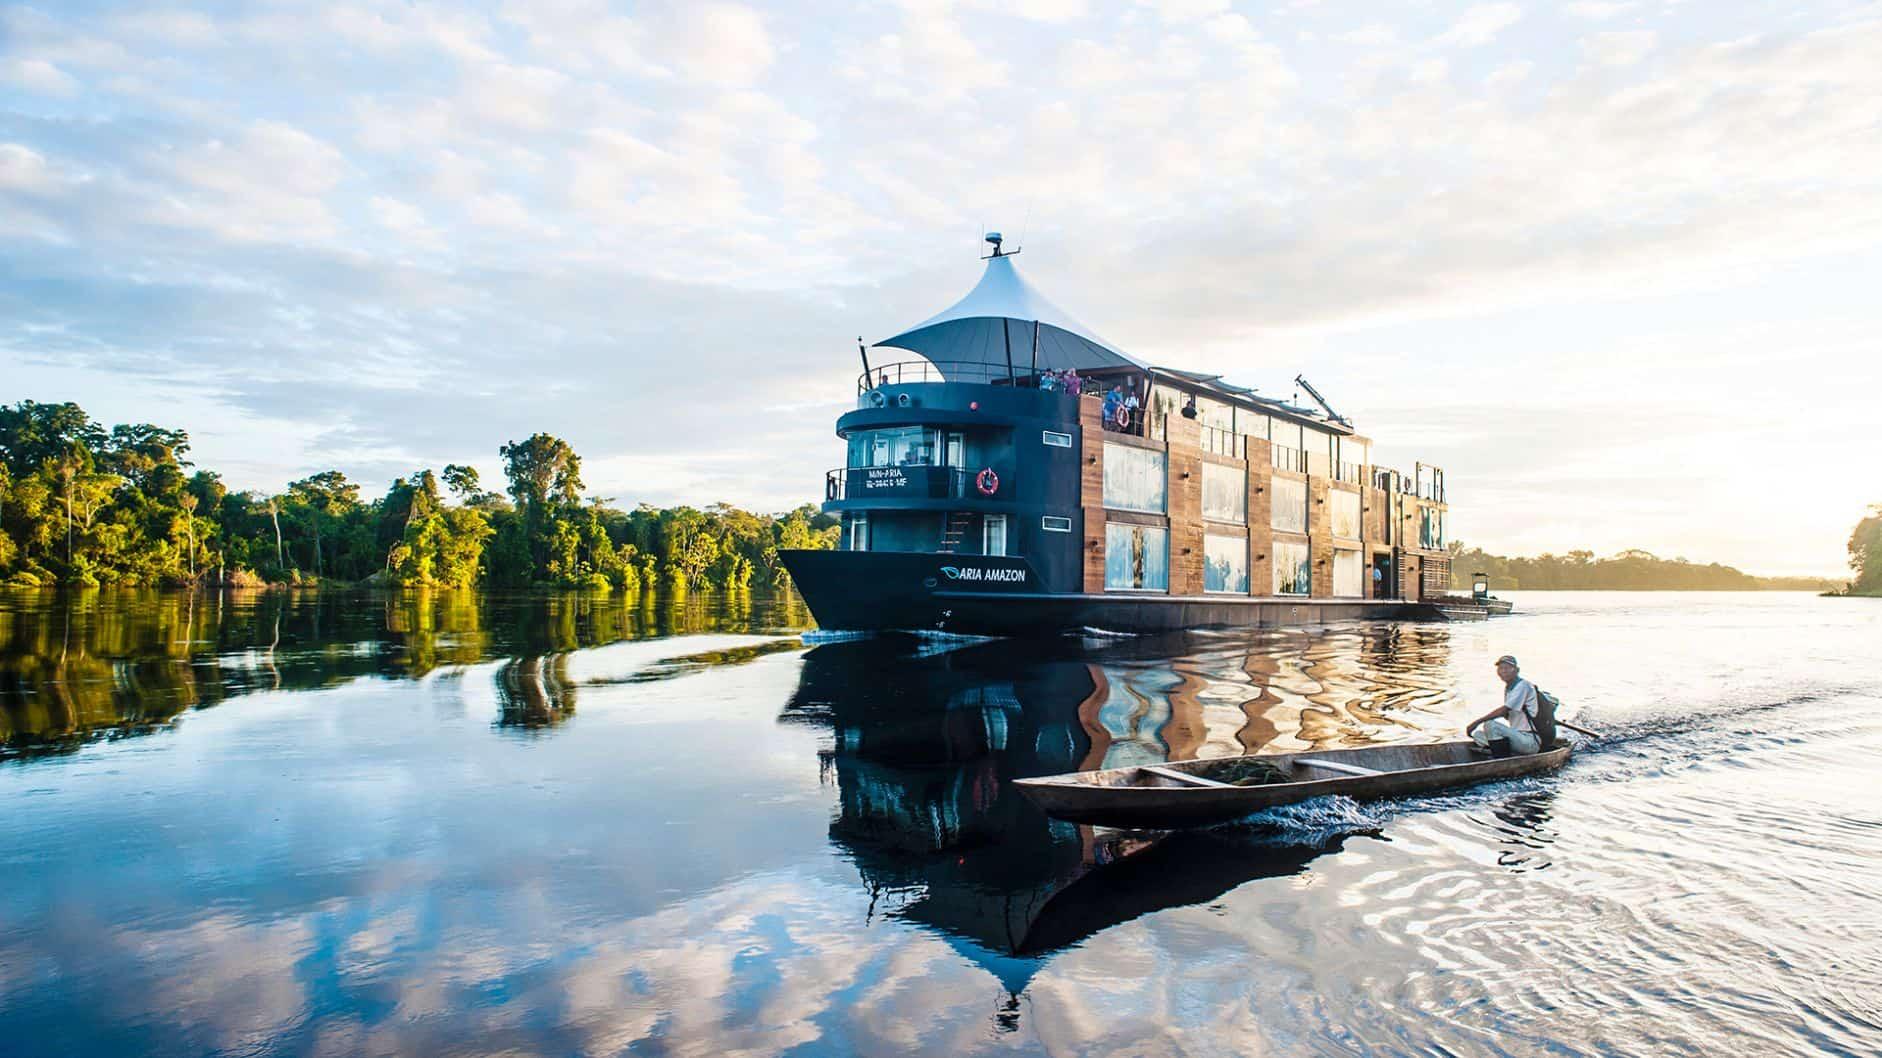 Aria Amazon Aqua Expeditions